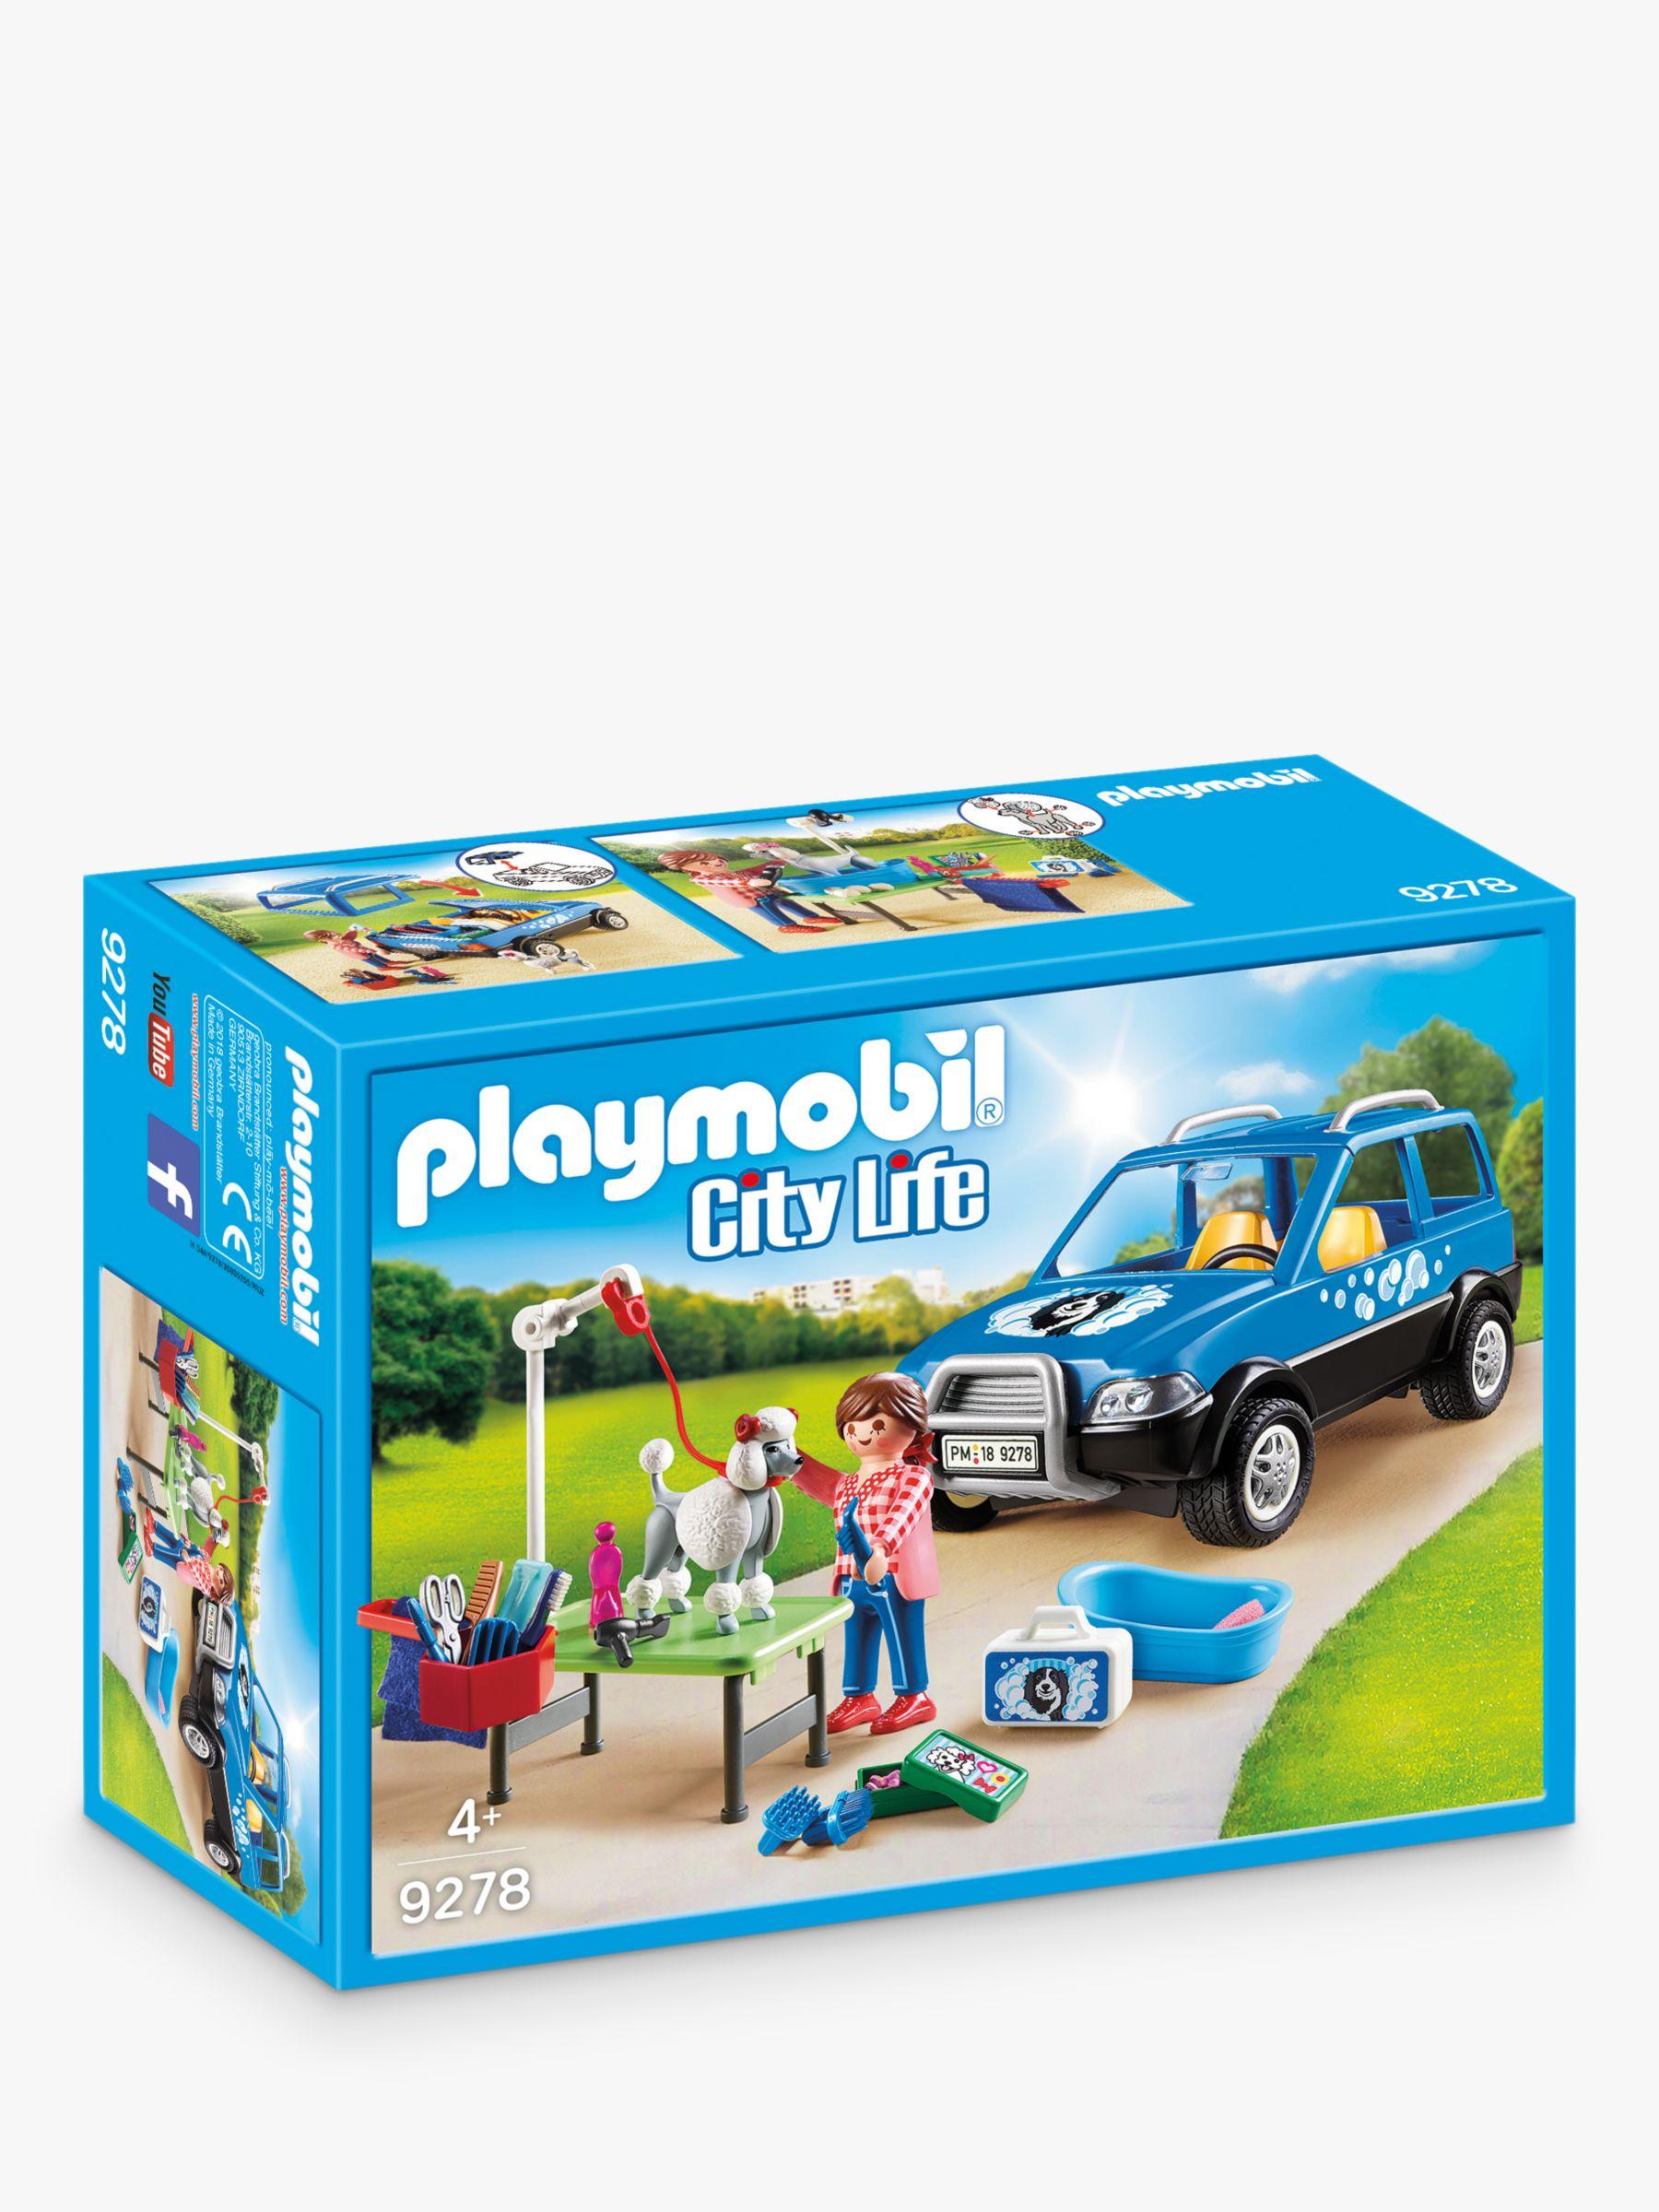 PLAYMOBIL Playmobil City Life 9278 Mobile Pet Groomer